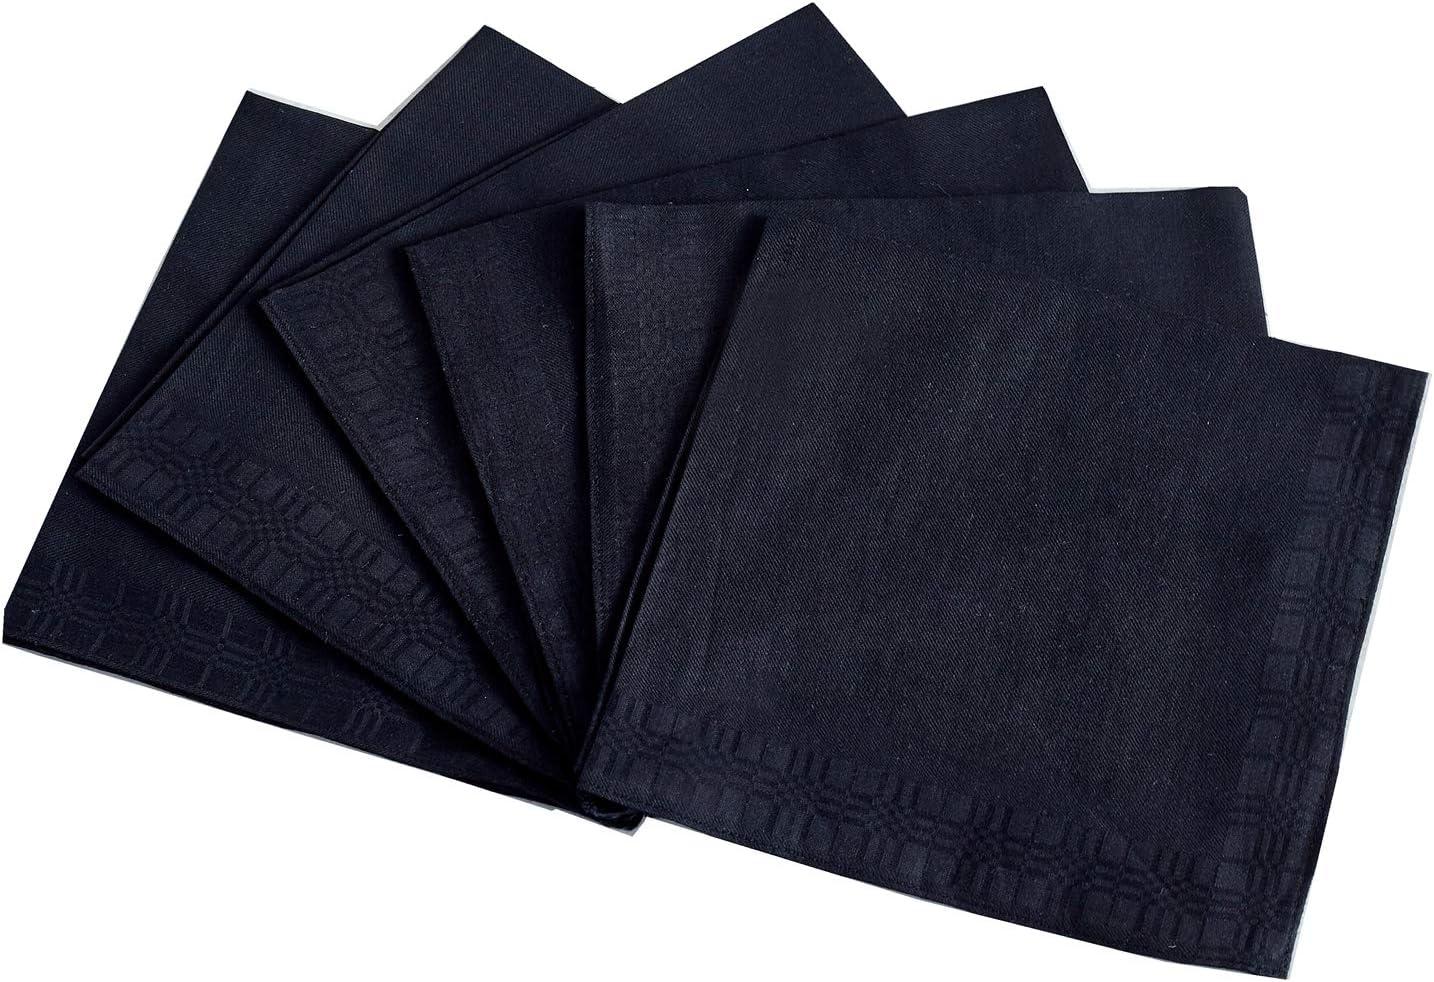 Men's Handkerchiefs,100% Soft Cotton,Black Hankie,Pack of 6